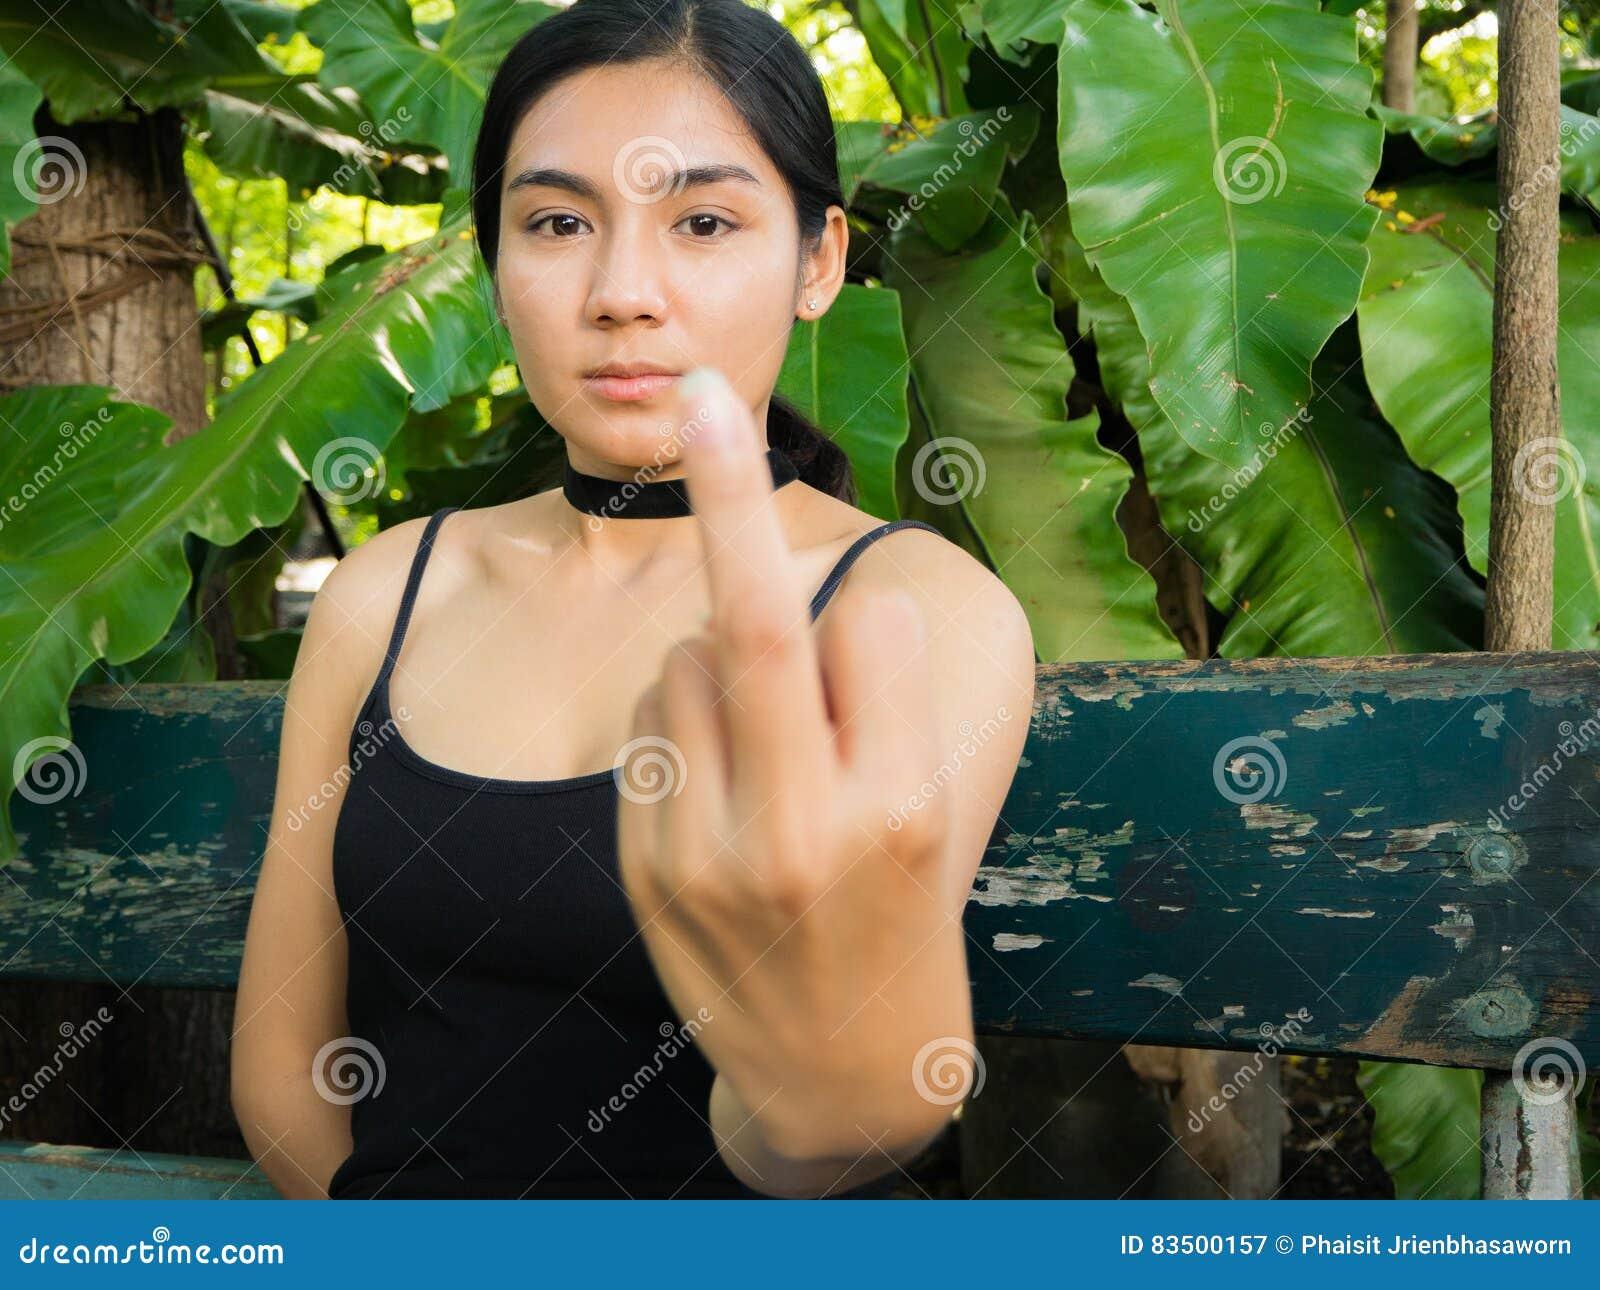 casting otngagged asian Woman